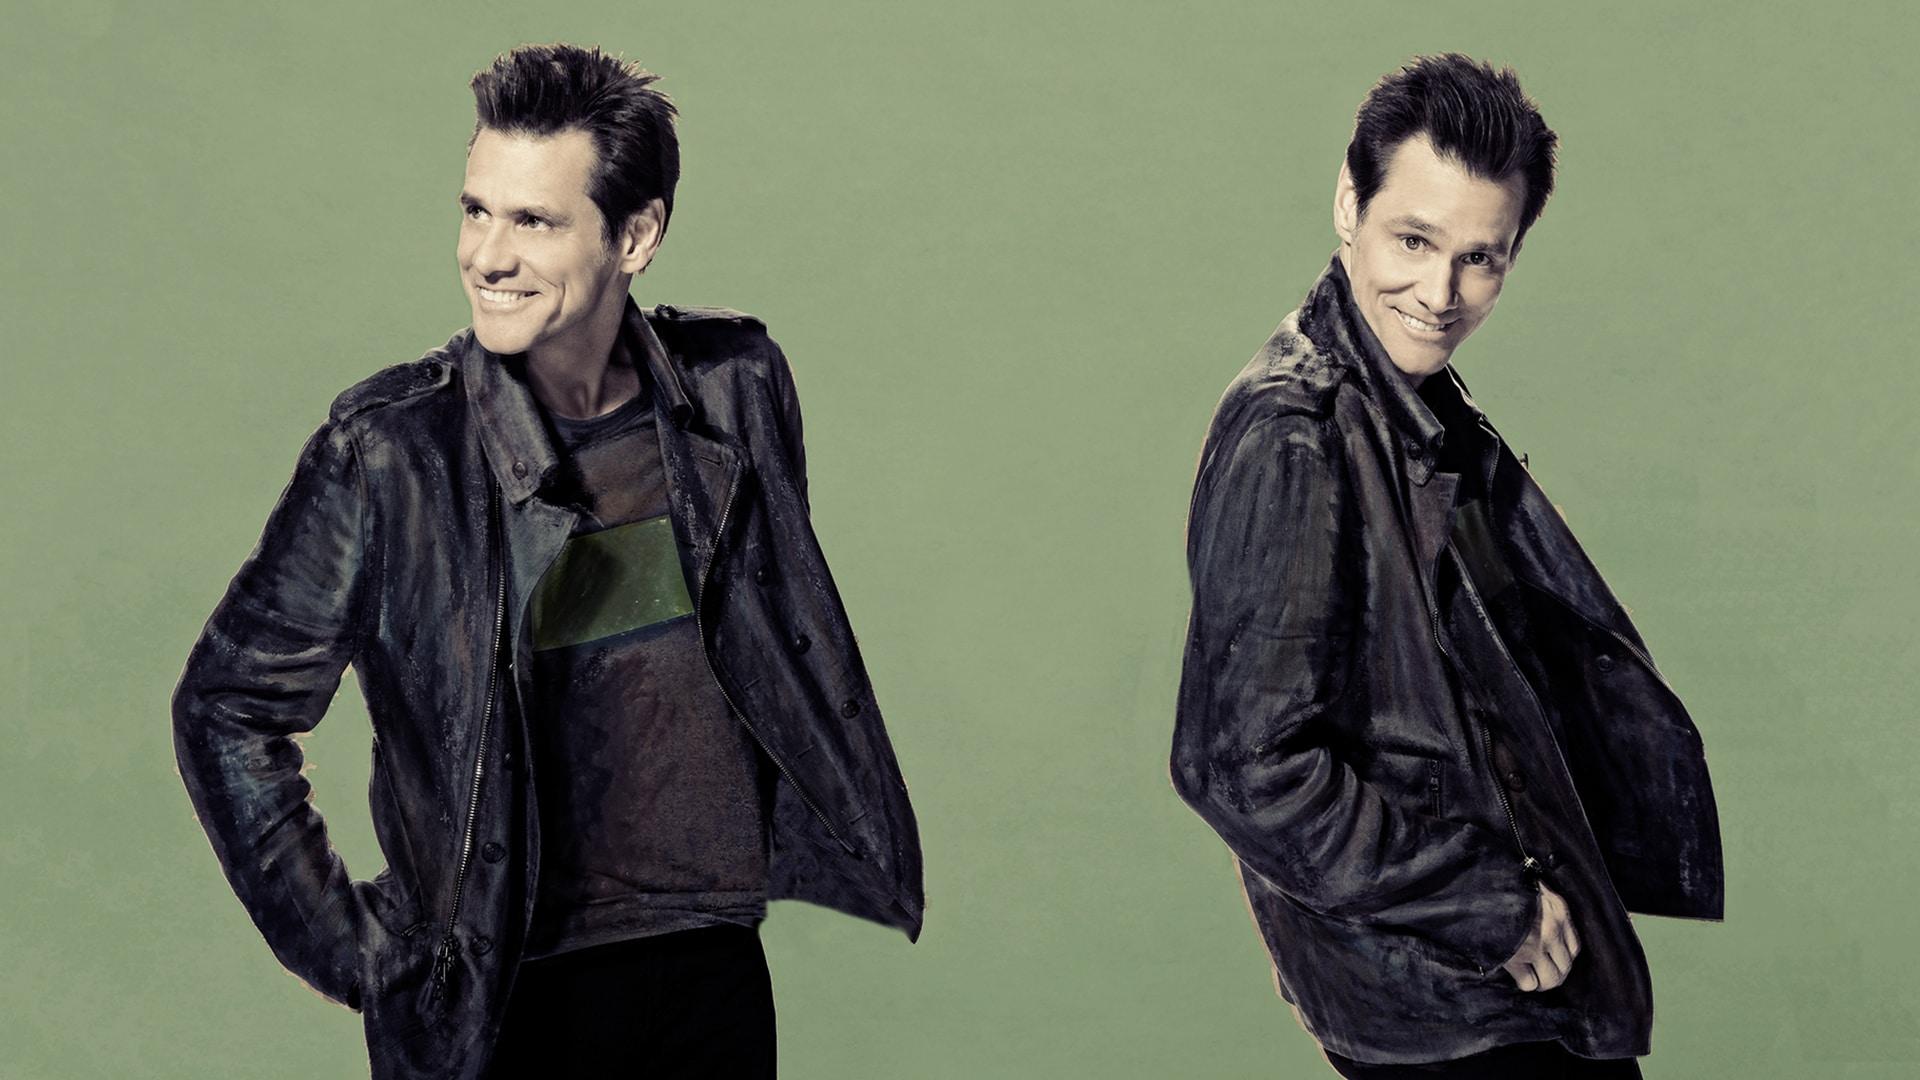 Jim Carrey: October 25, 2014